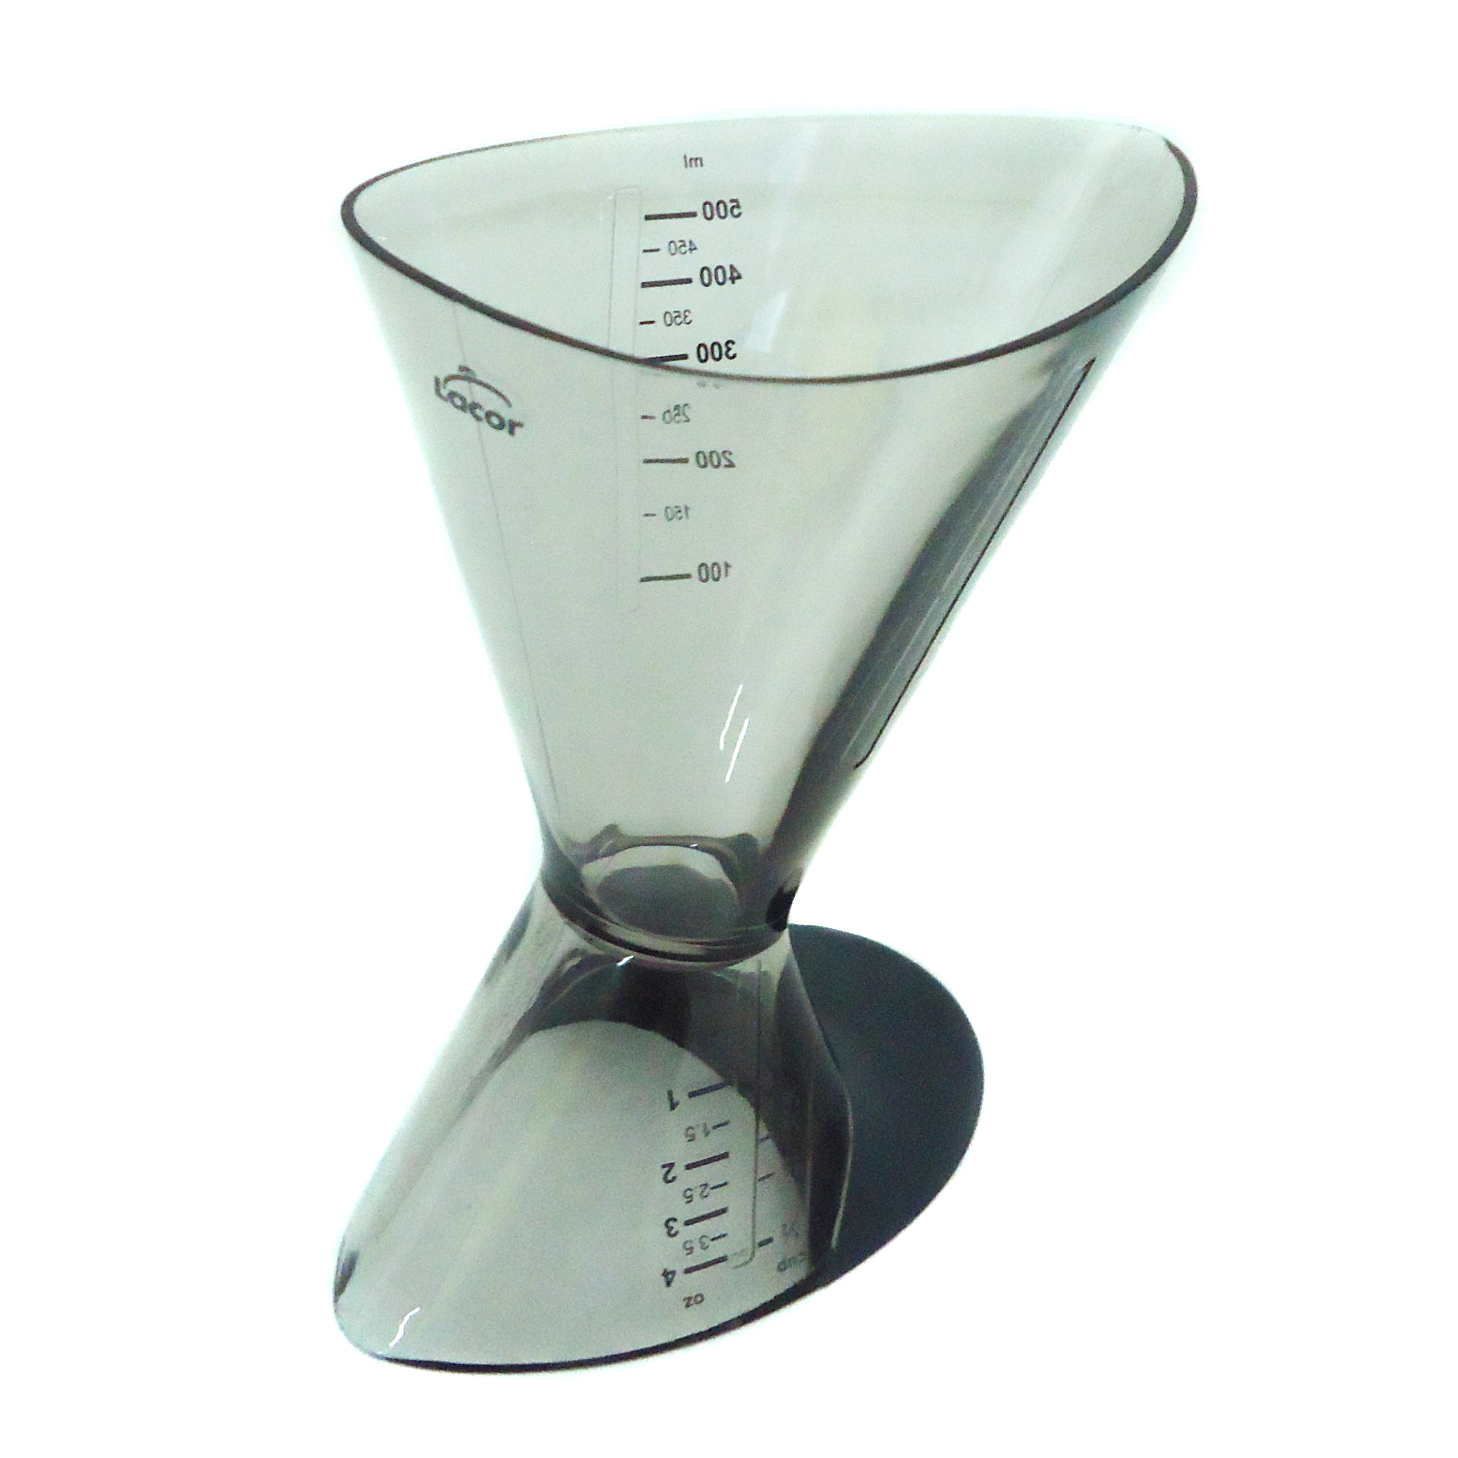 LACOR 67137 Κανάτα Μεζούρα Διπλή (500ml & 100ml) επαγγελματικός εξοπλισμός   επαγγελματικά σκεύη είδη σερβιρίσματος   εργαλεία κο